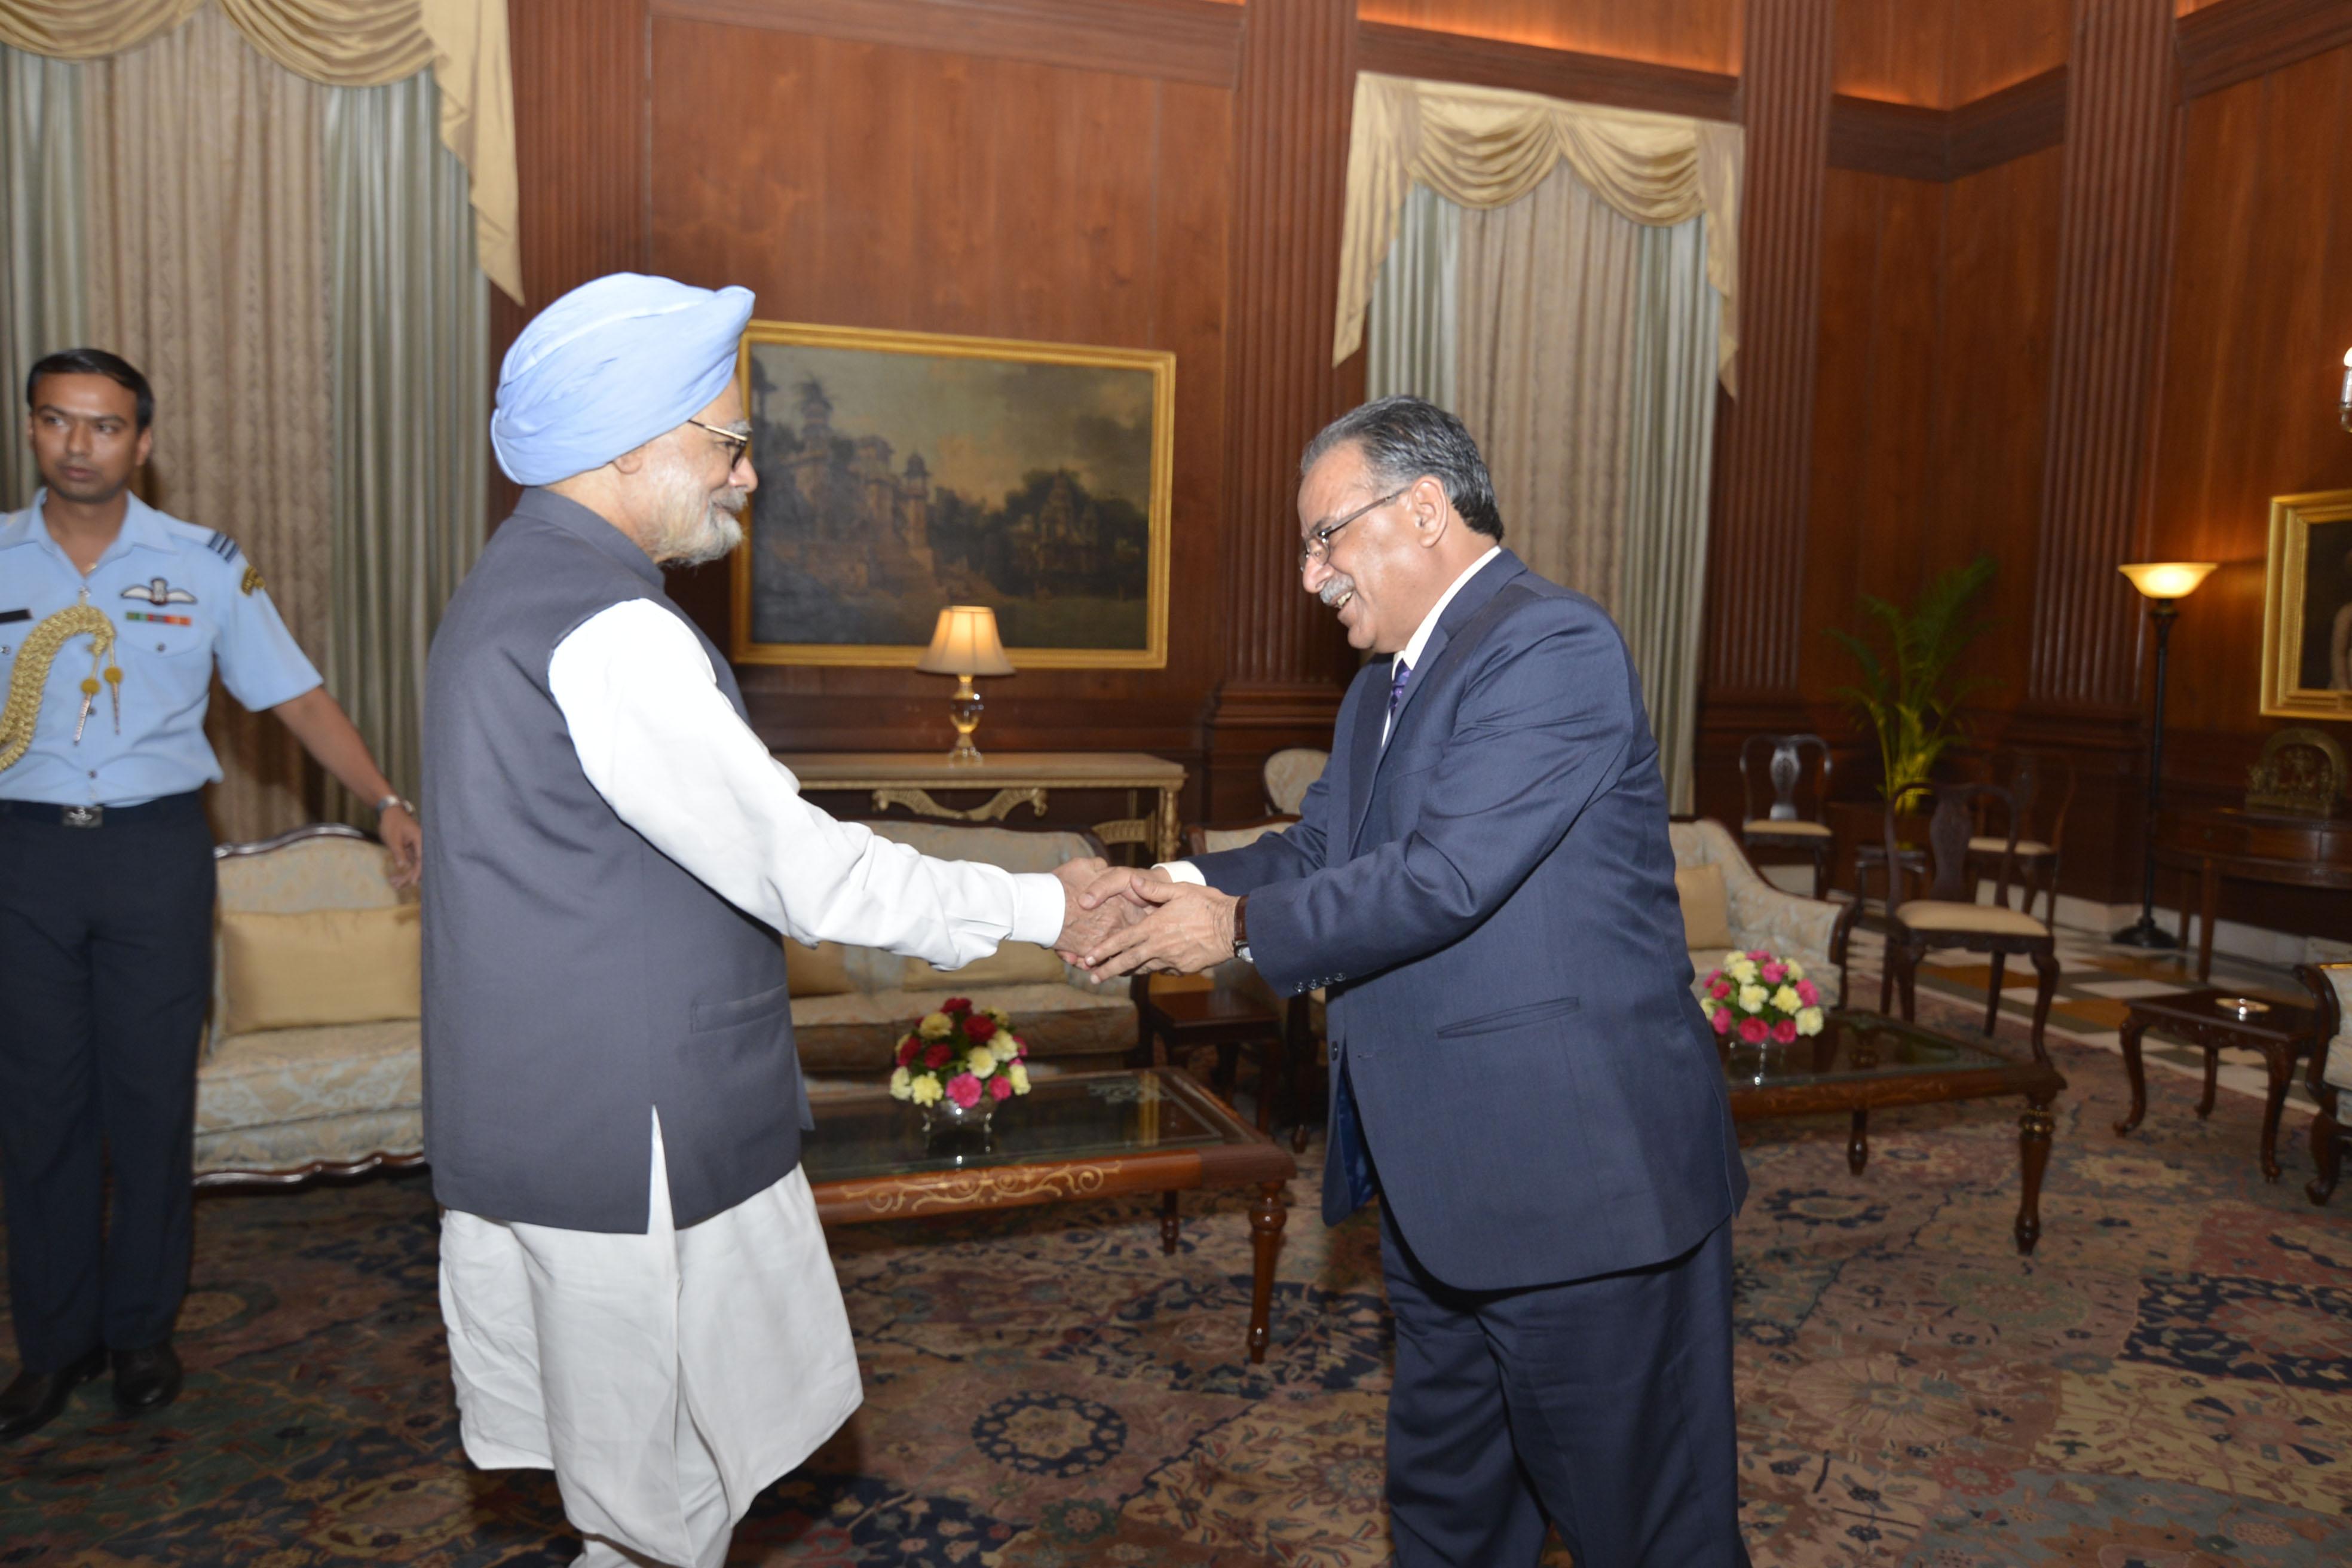 Former Prime Minister of India Manmohan Singh (left) meets Nepal's Prime Minister Pushpa Kamal Dahal at Rashtrapati Bhawan, in New Delhi, on Saturday, September 17, 2016. Photo courtesy: PM Secretariat